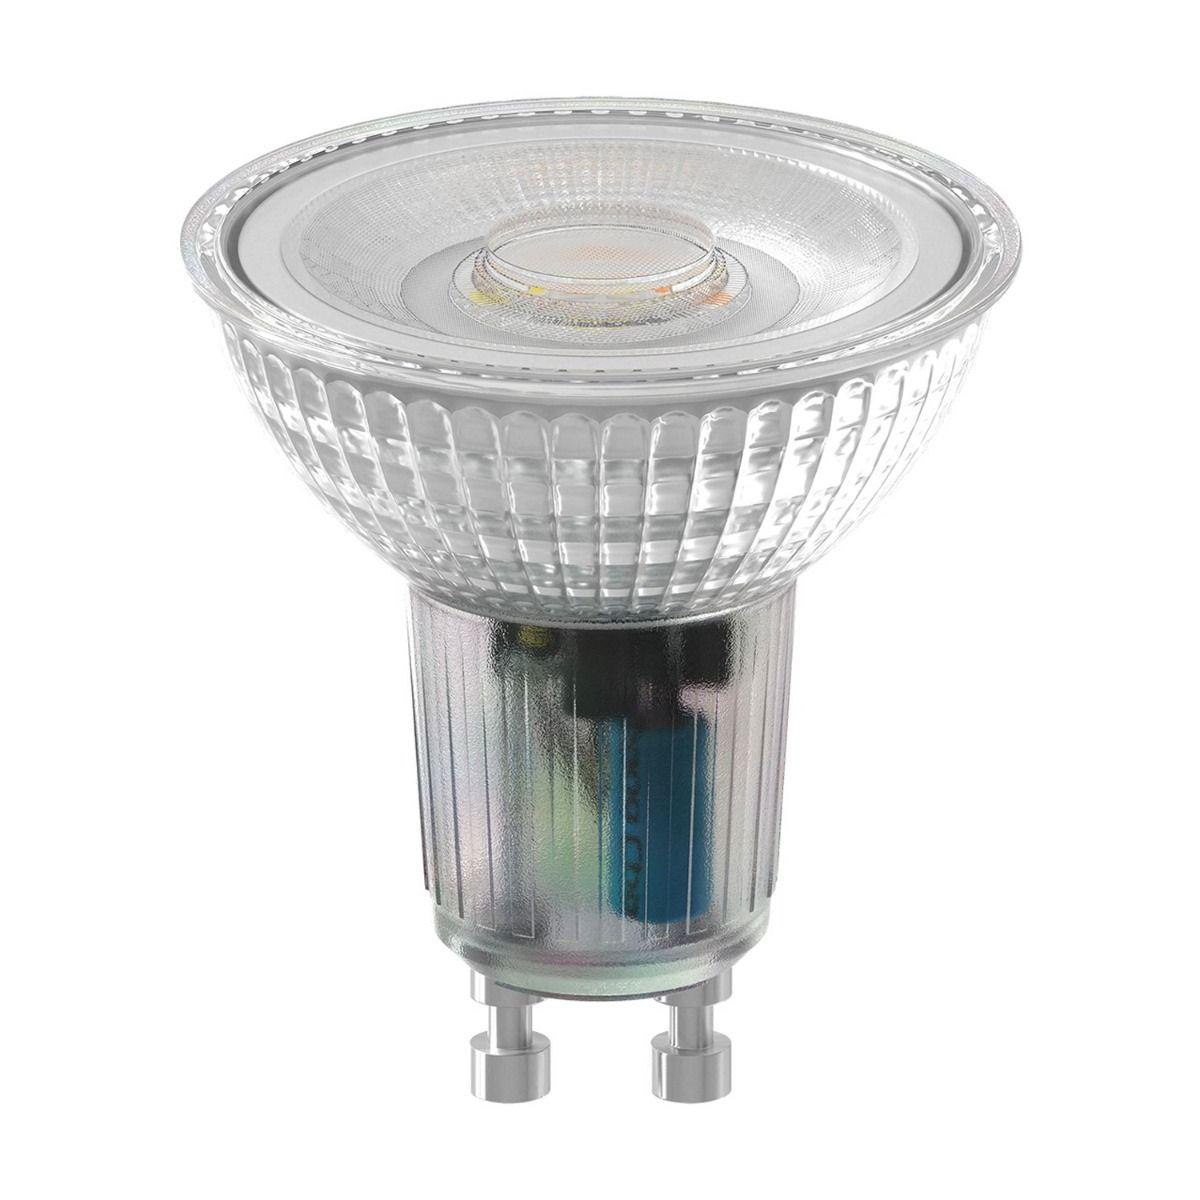 Calex Smart Reflektor LED-Spot GU10 5W 345lm 2200-4000K   Tuya Wifi